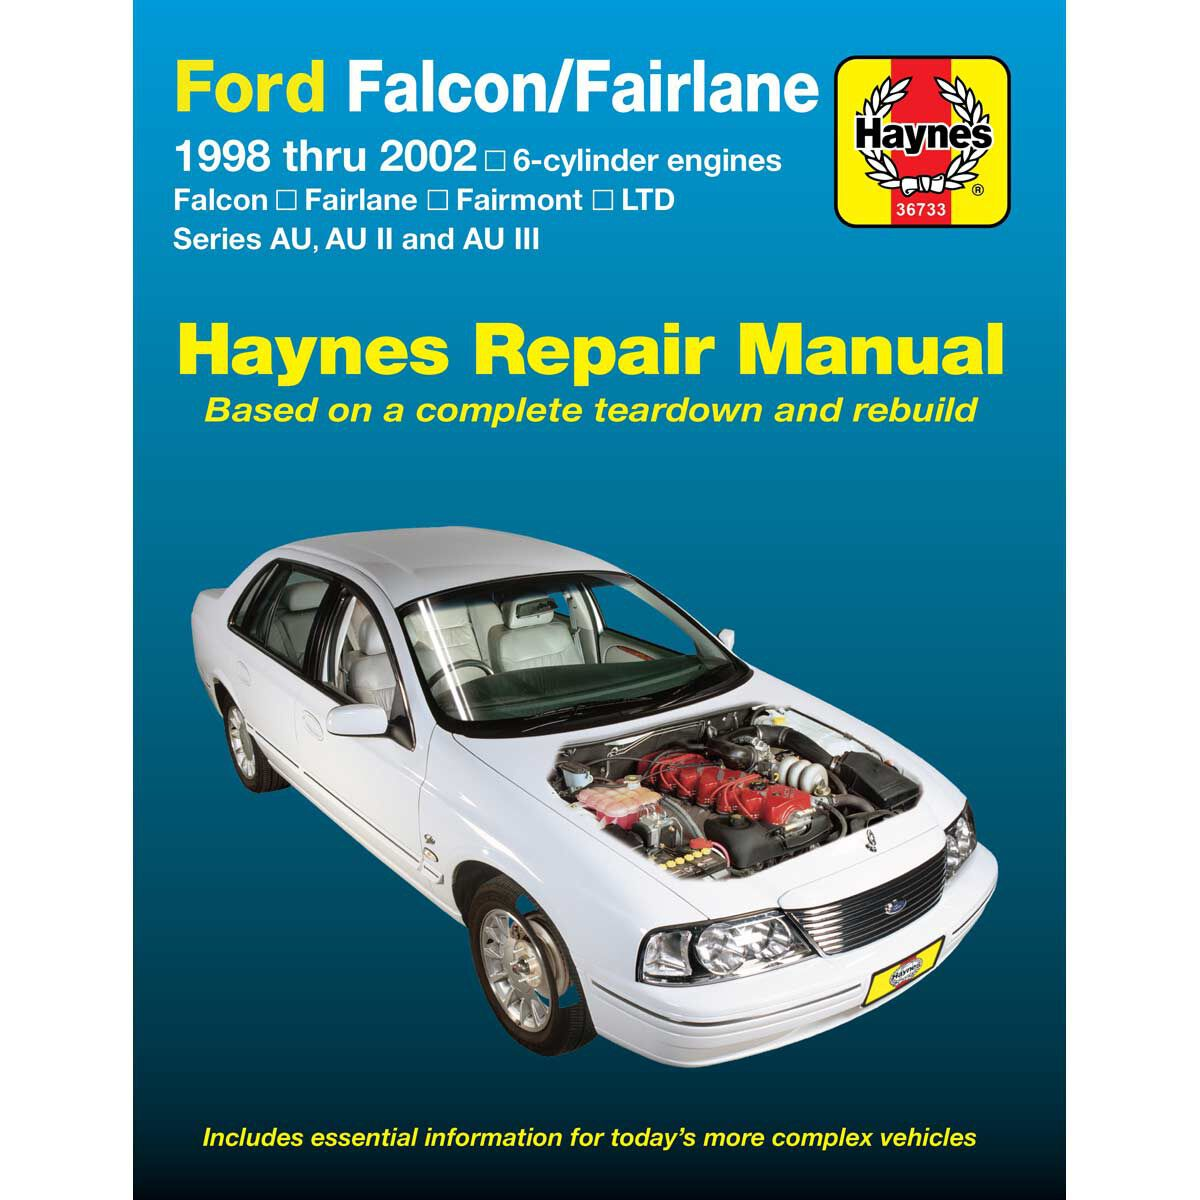 2002 Ford Escape Xlt Owners Manual Garage Door Opener Circuit Design Tom39s Maker Site Array Car Manuals Supercheap Auto Rh Supercheapauto Com Au